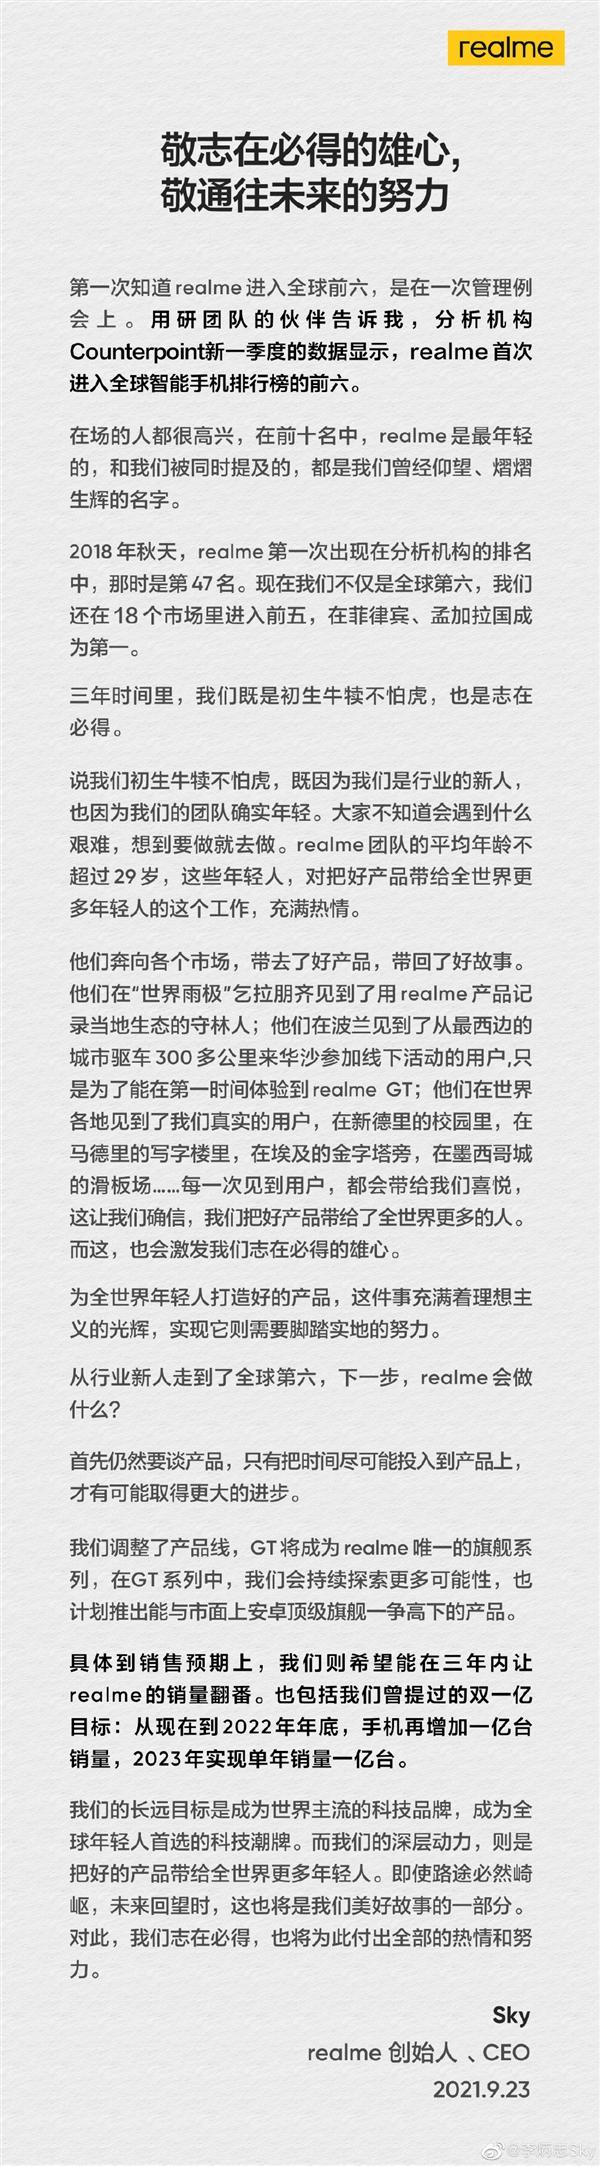 realme CEO李炳忠预告王牌旗舰:将与安卓阵营顶级旗舰一争高下